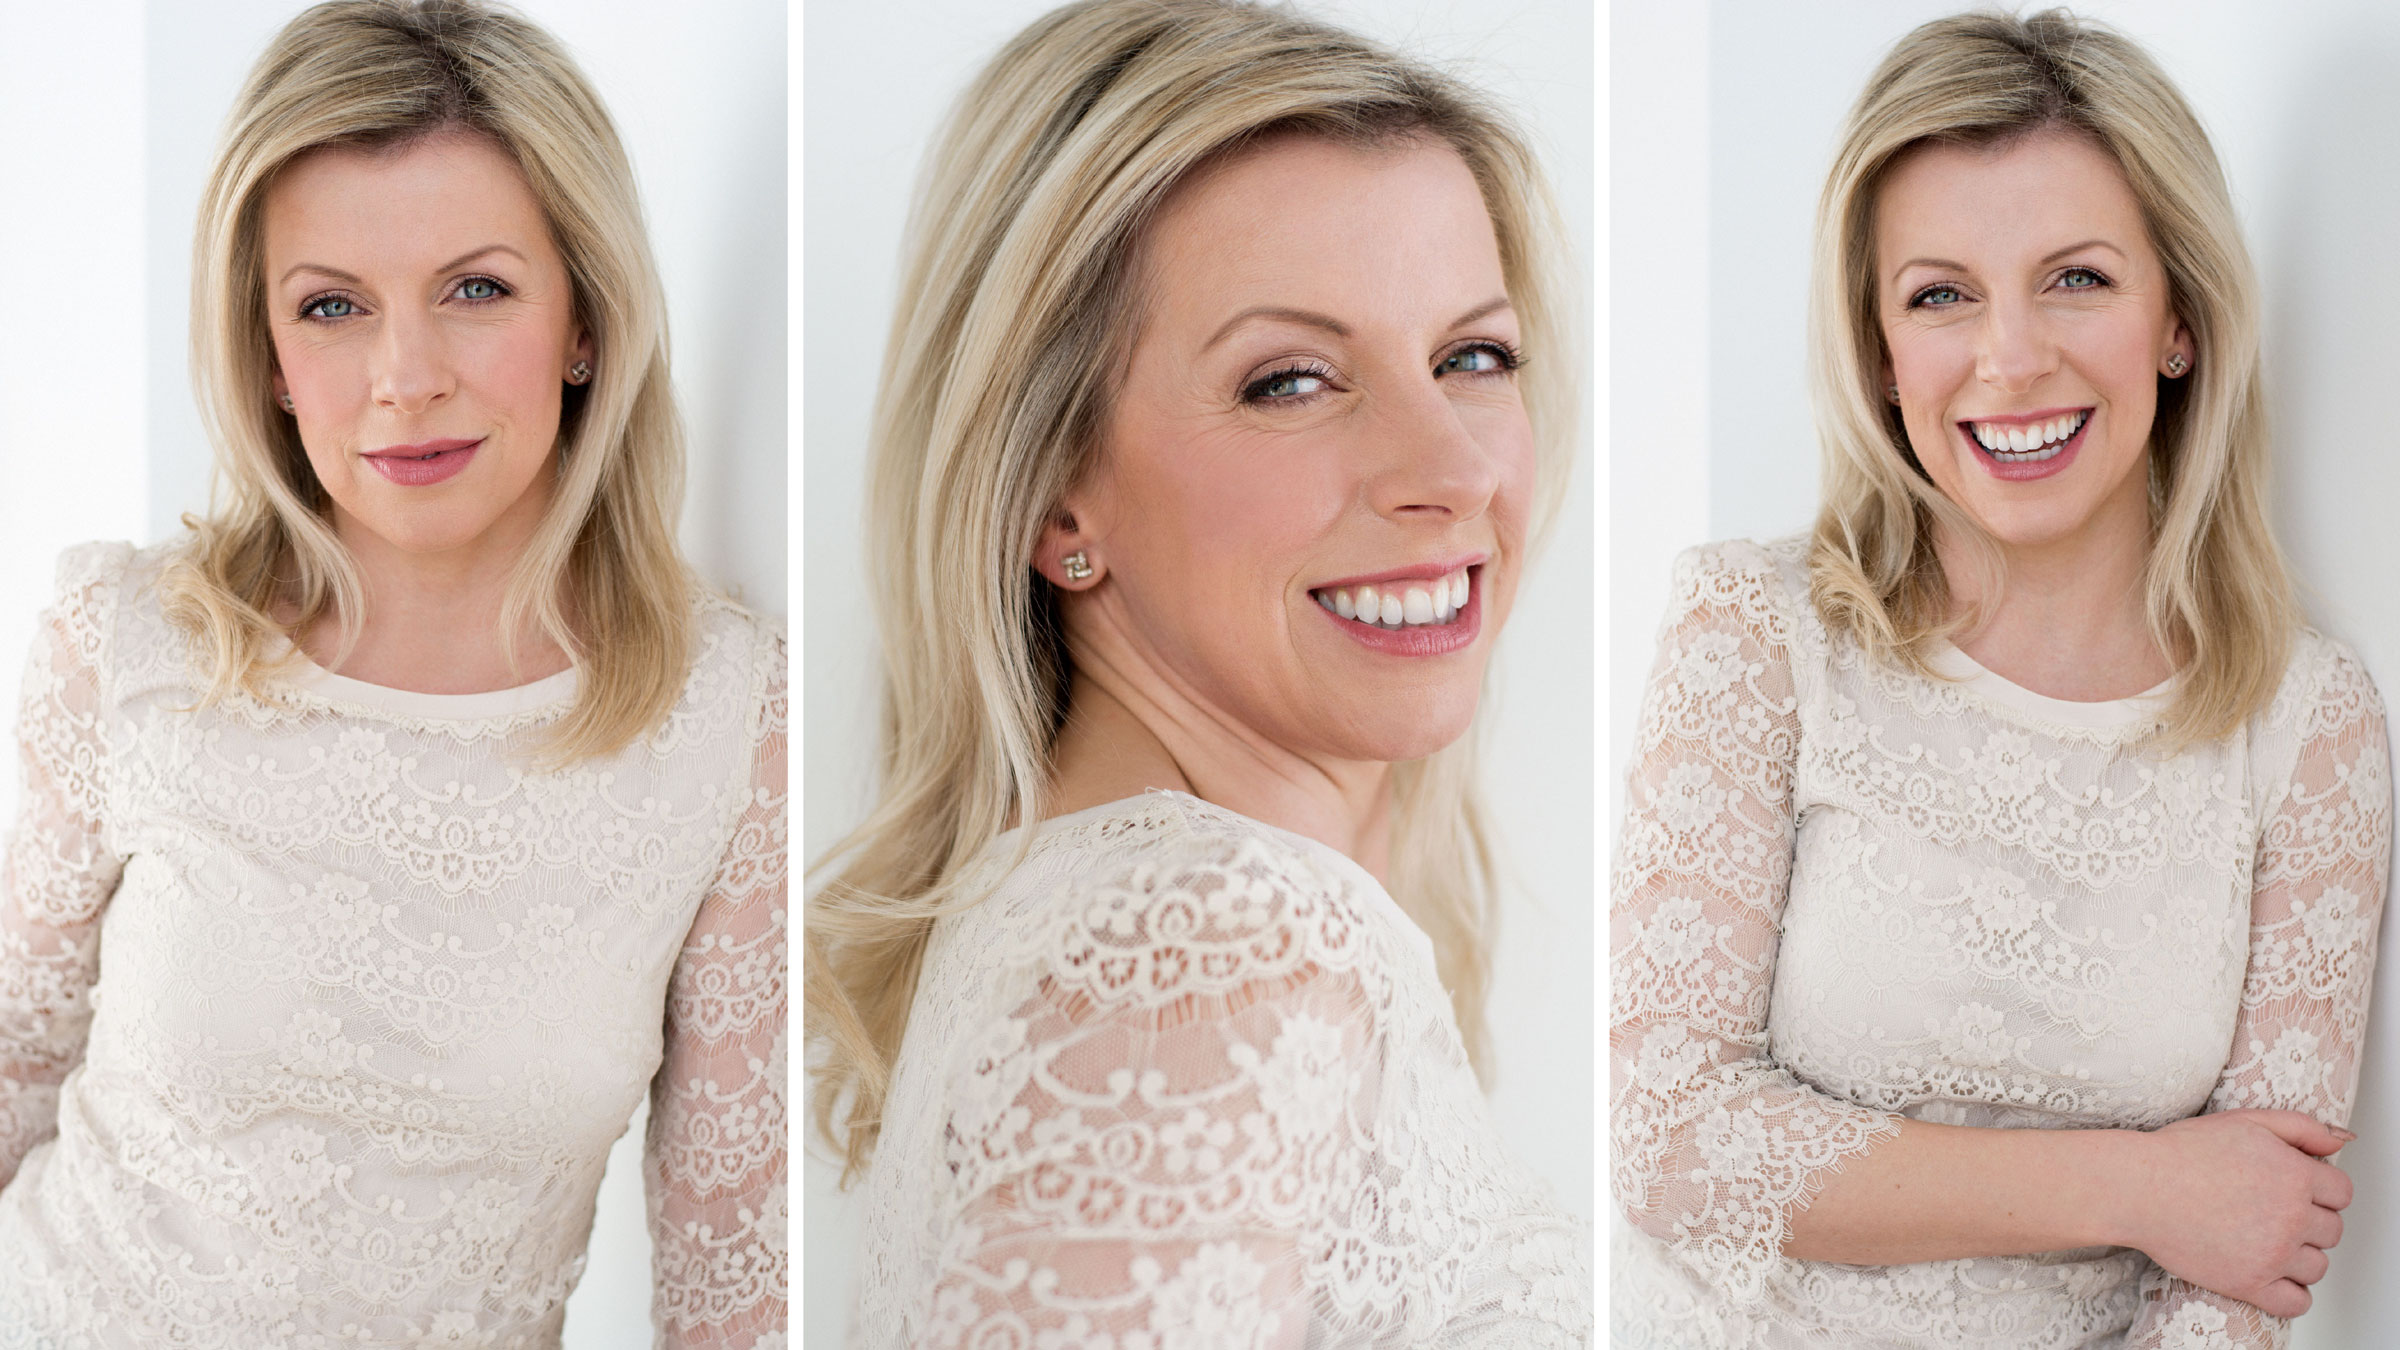 Charlotte-kensington-portraits-headshots-1.jpg